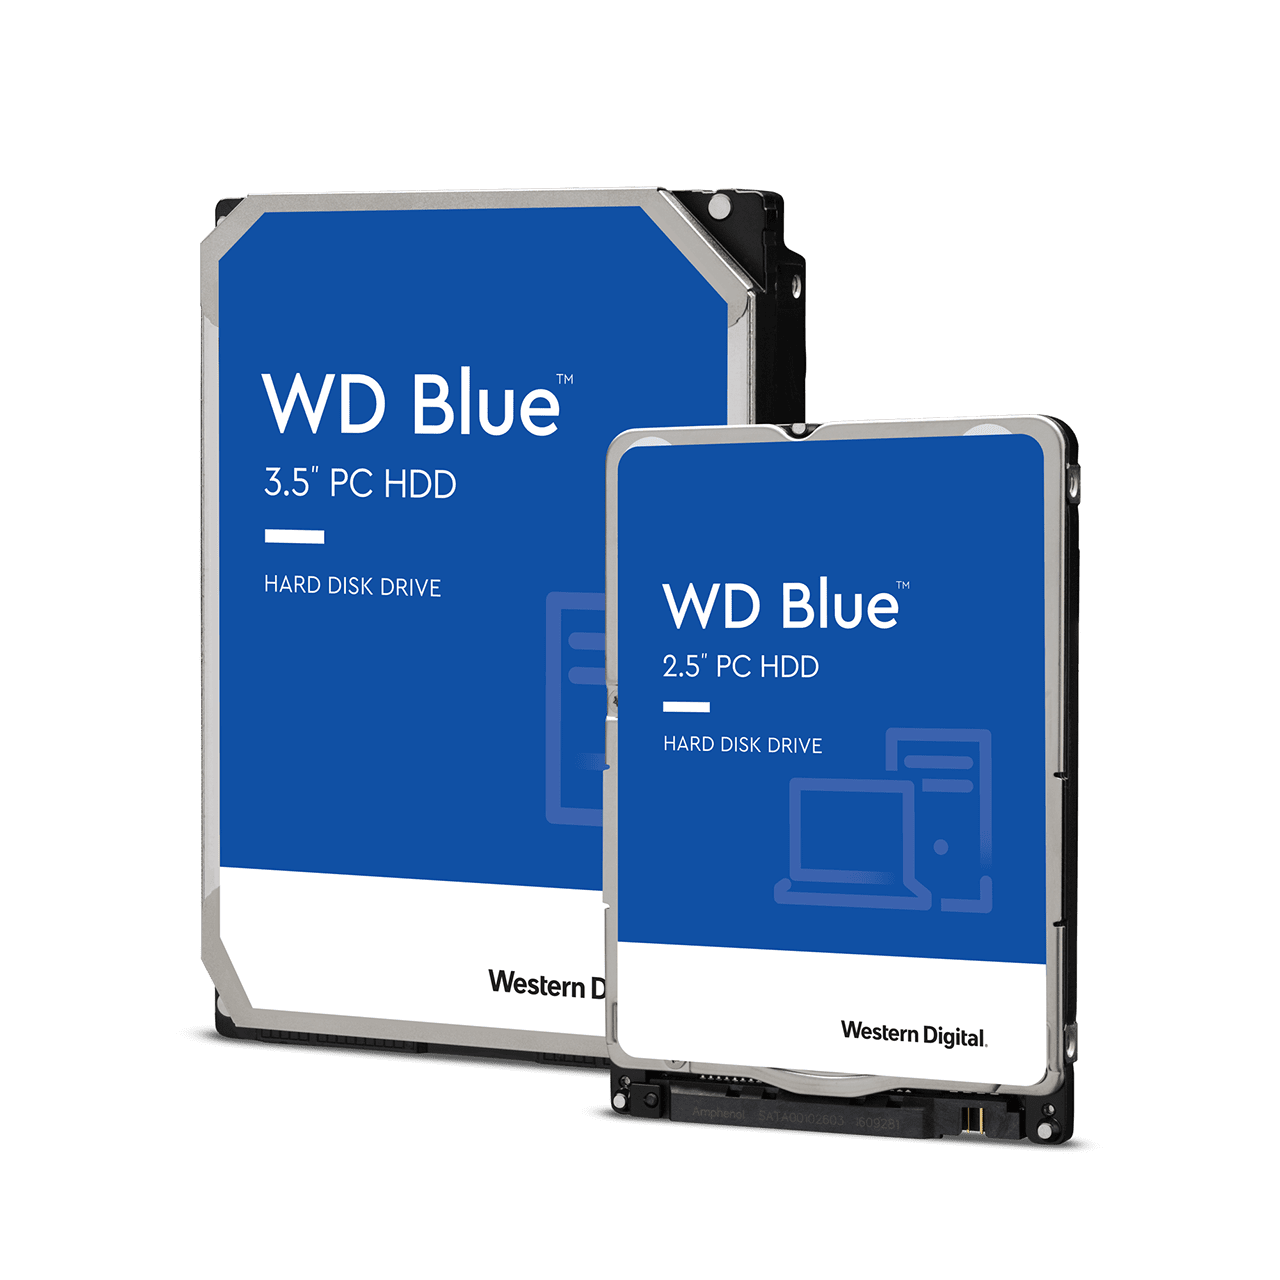 WD Green SATA SSD